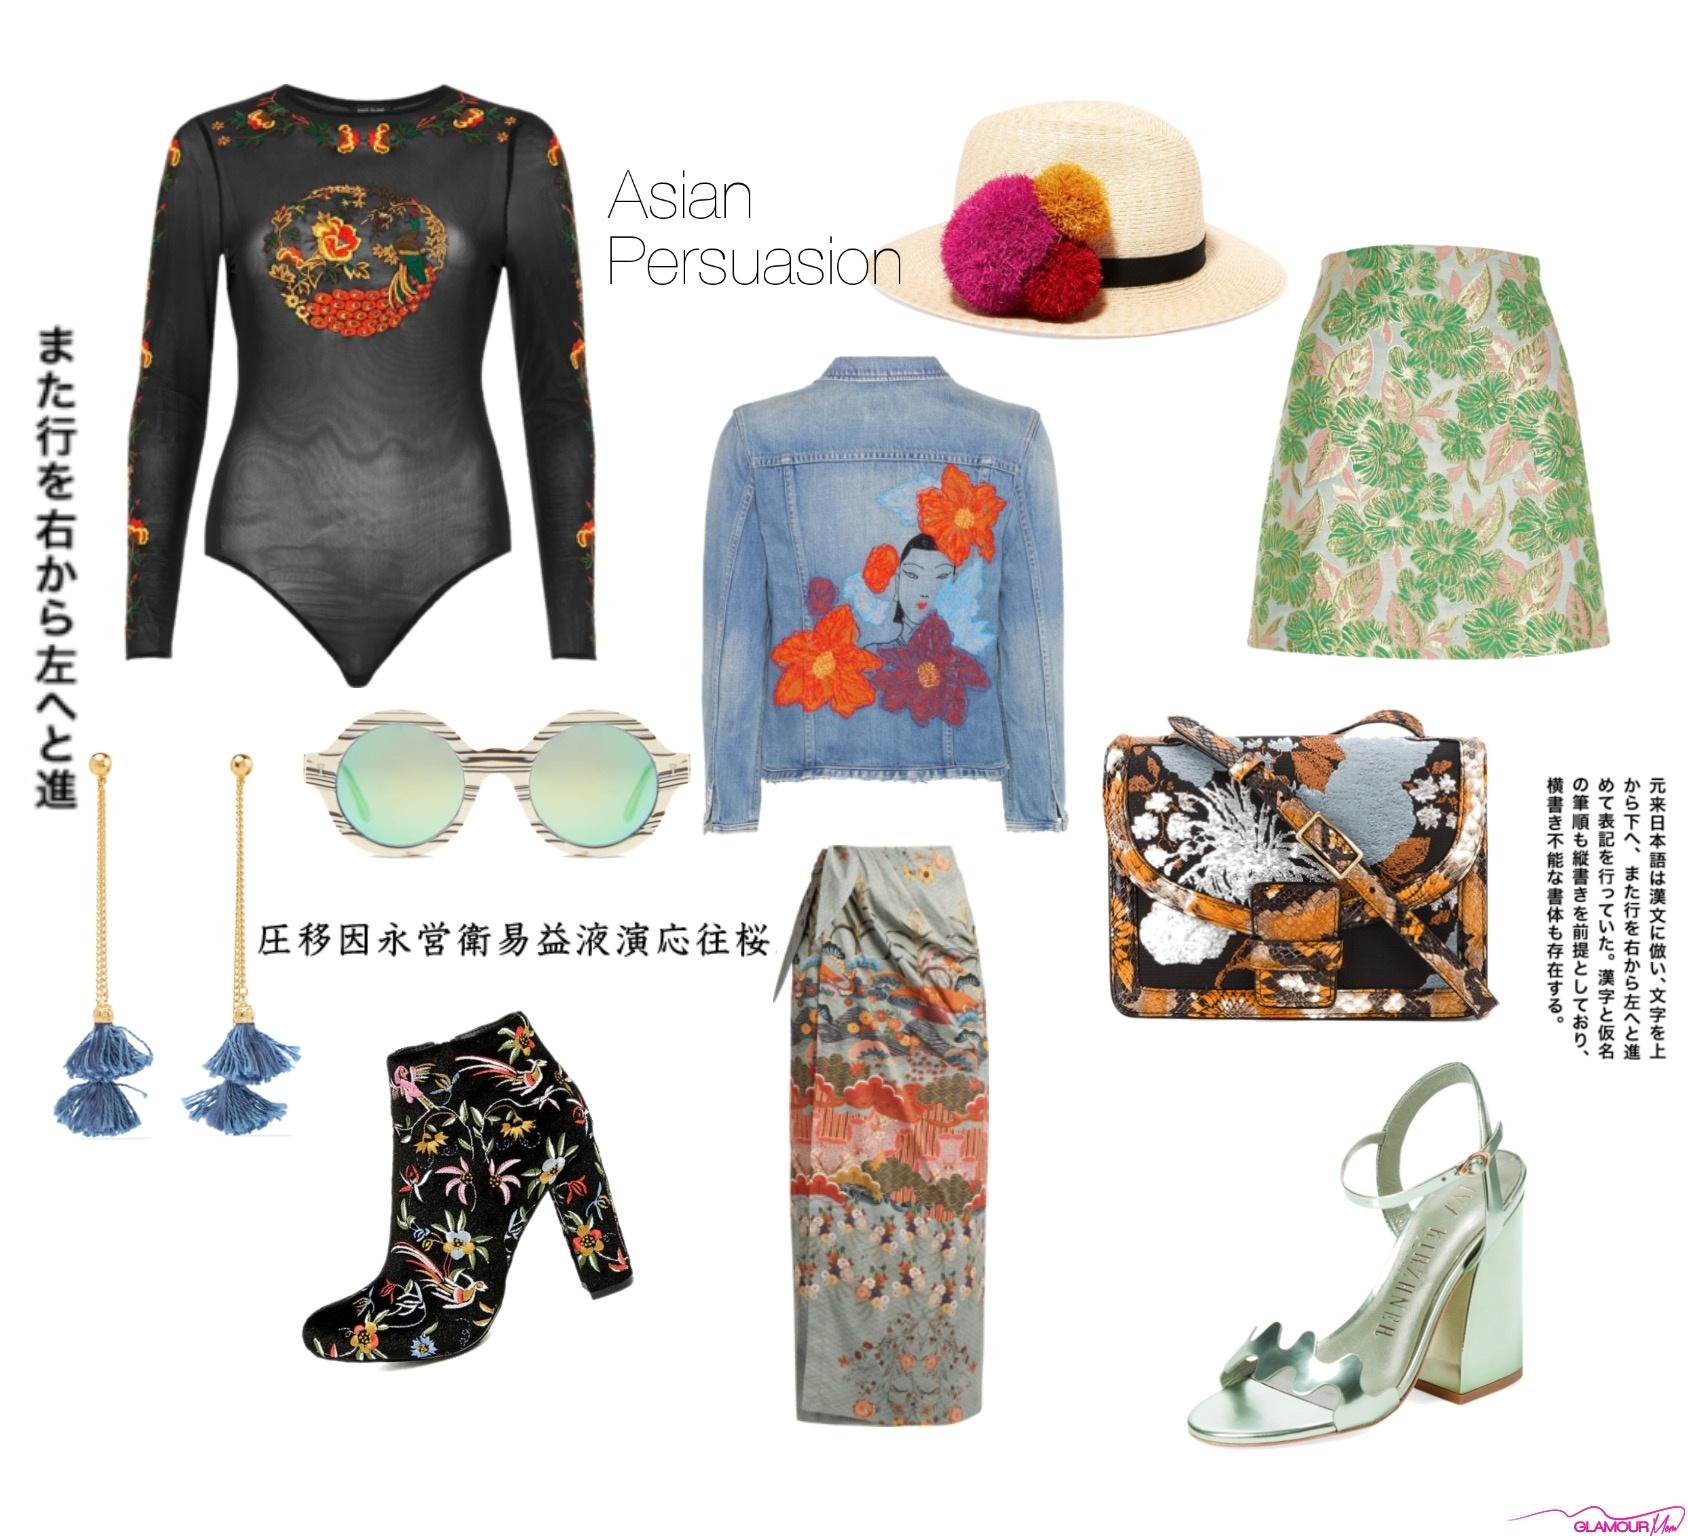 Glam Up Your Summer Wardrobe With Kimonos + Dragon Prints